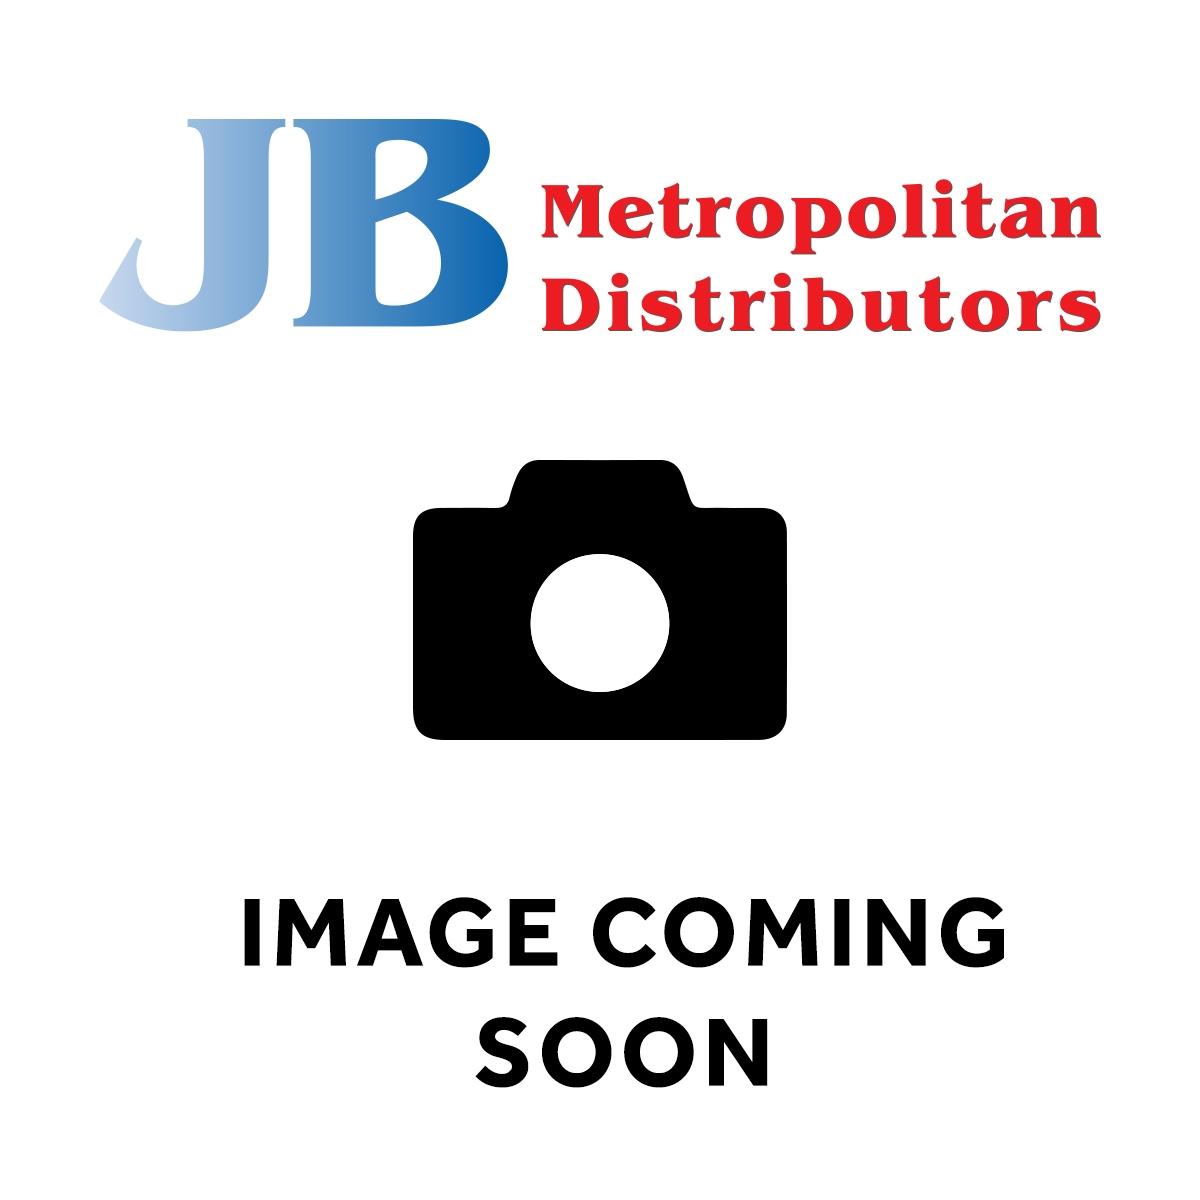 95G JOHN WEST TUNA TEMPTERS SAVOURY TOMATO & ONION